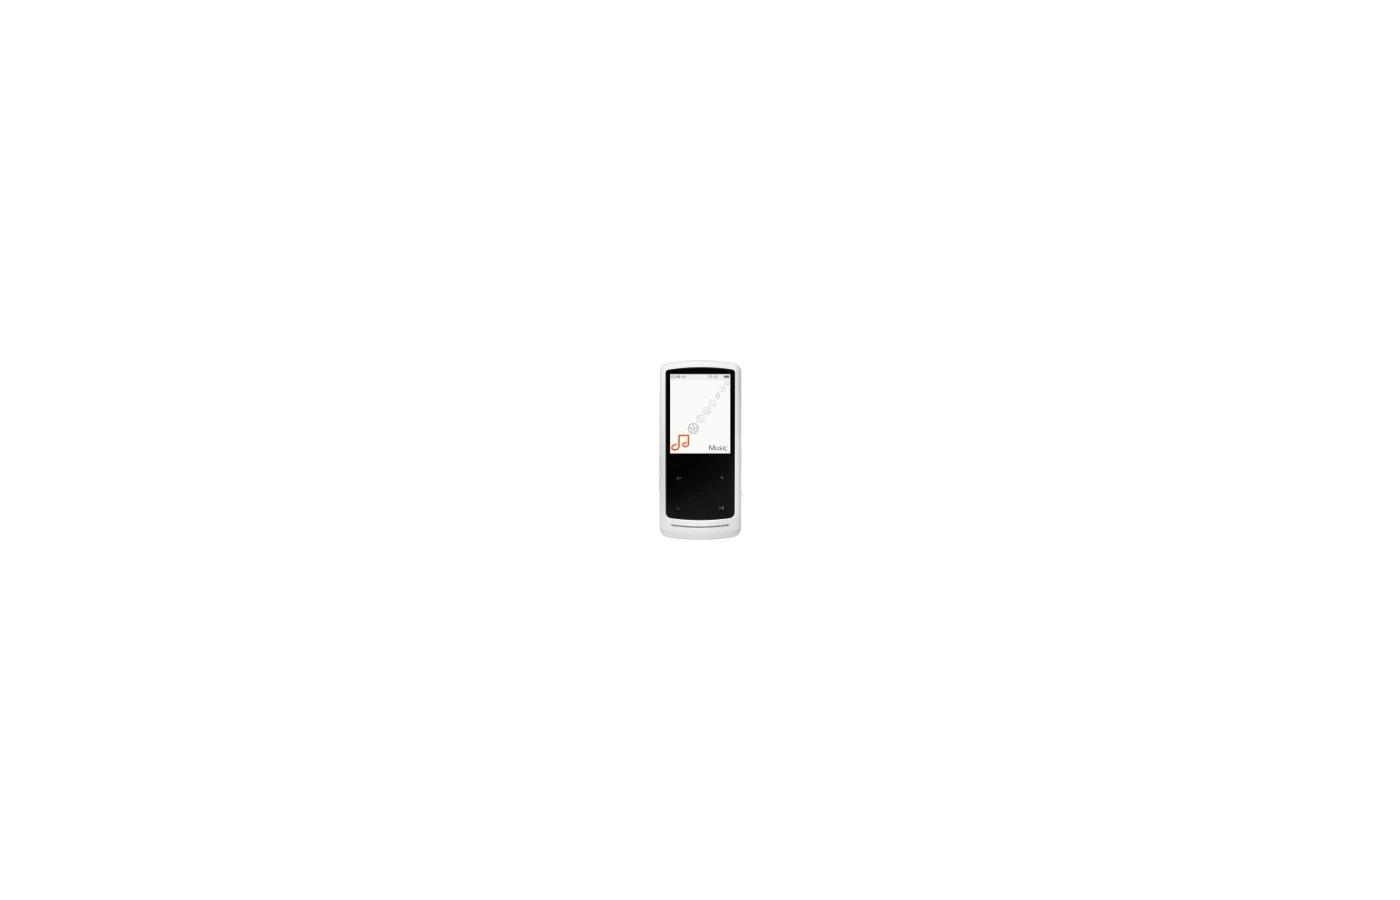 МР3 плеер Cowon Iaudio 9+ 16 белый